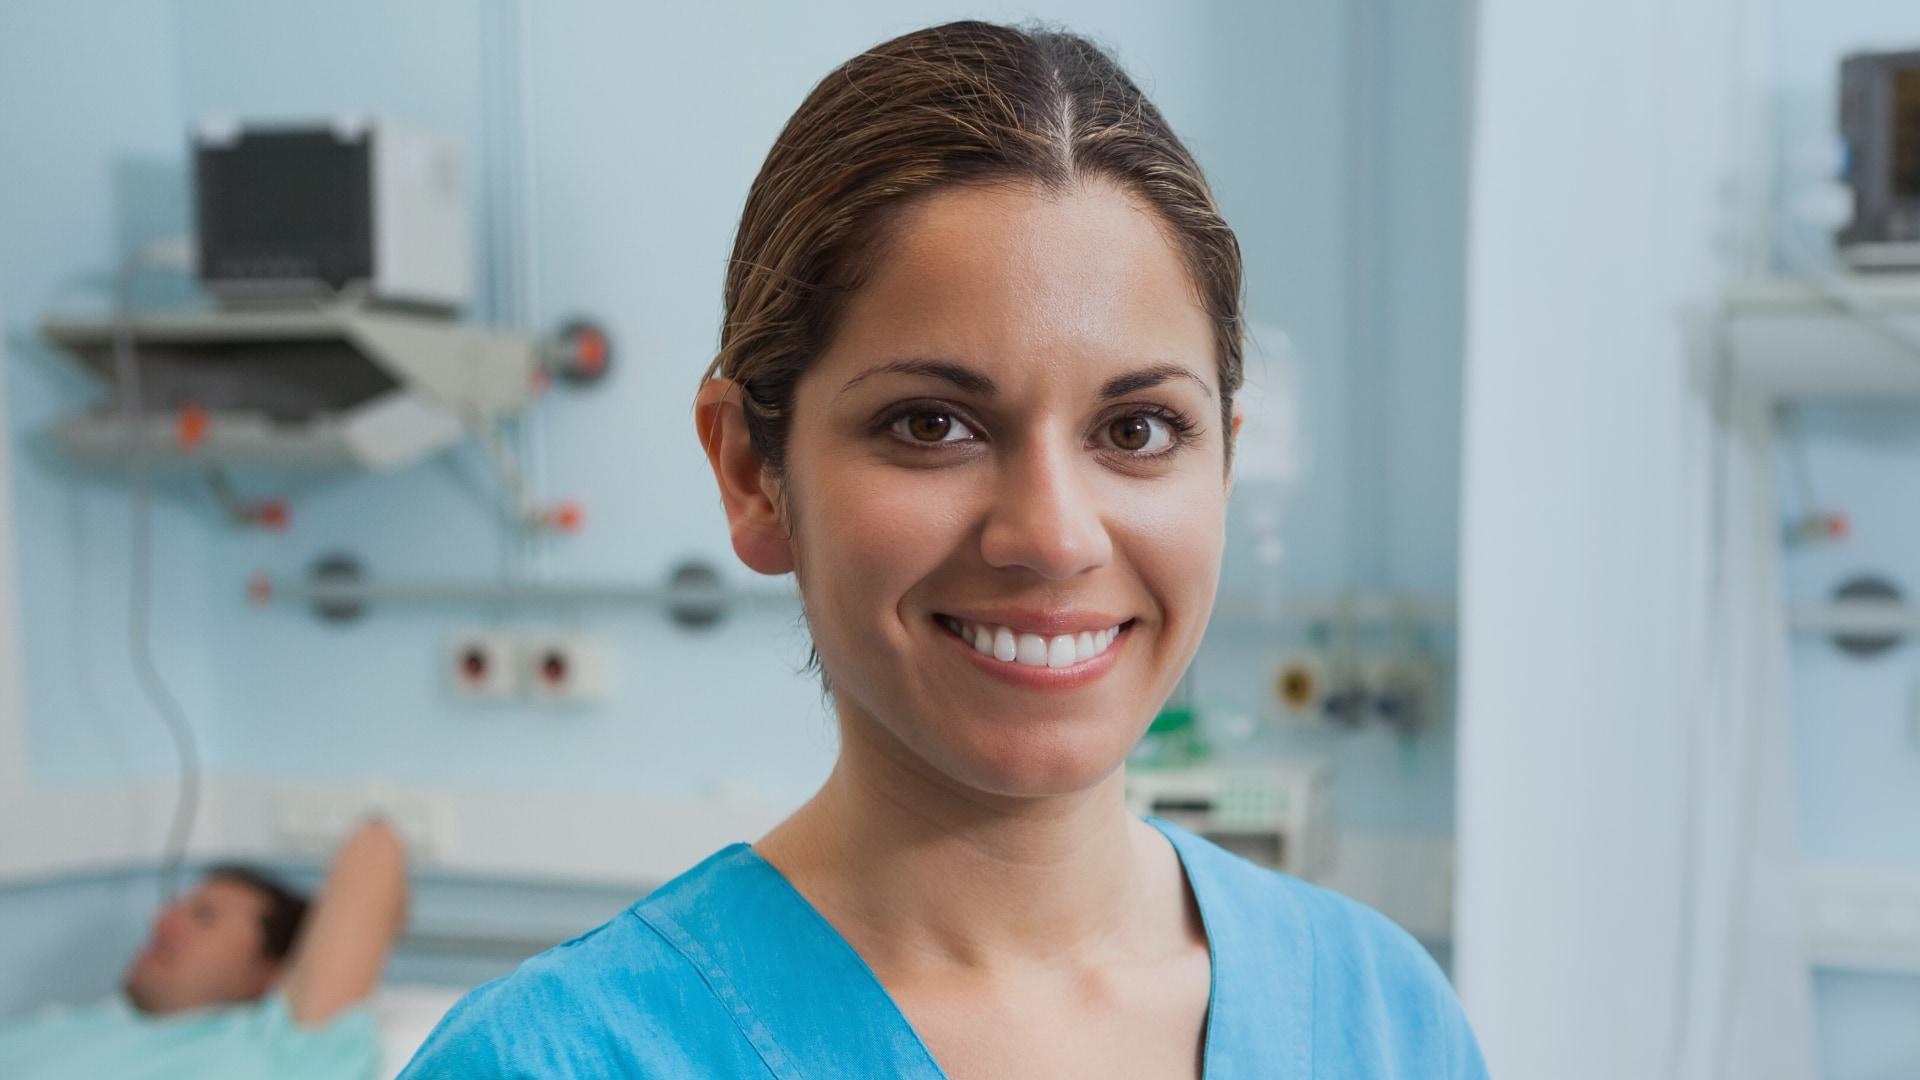 Piaget comemora Dia Internacional do Enfermeiro